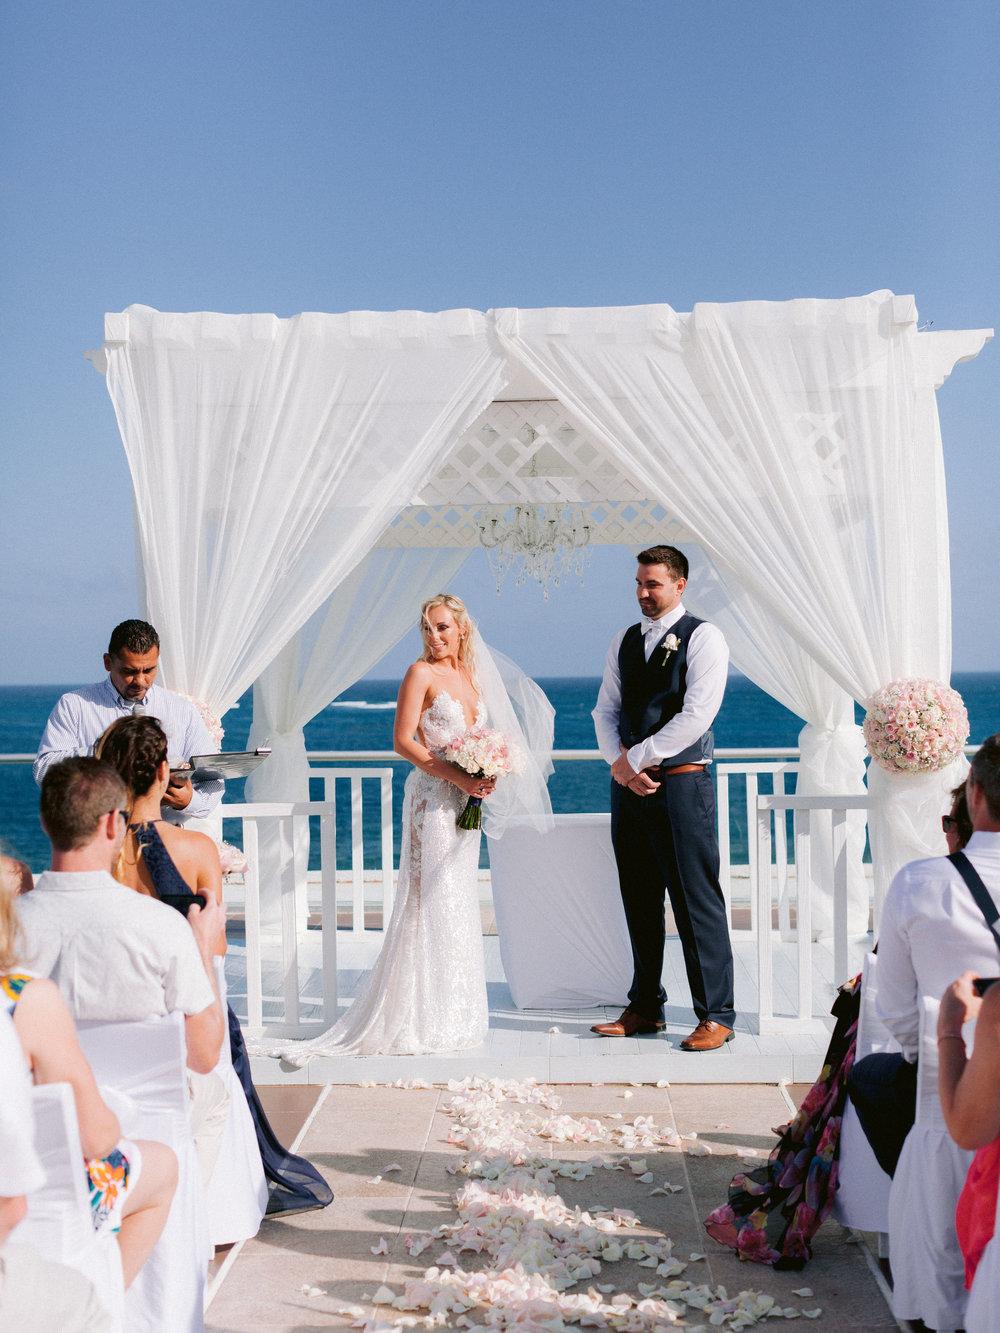 Kim_Jeff_Cancun Wedding_Ceremony_Kurtz_Orpia (60 of 119).jpg